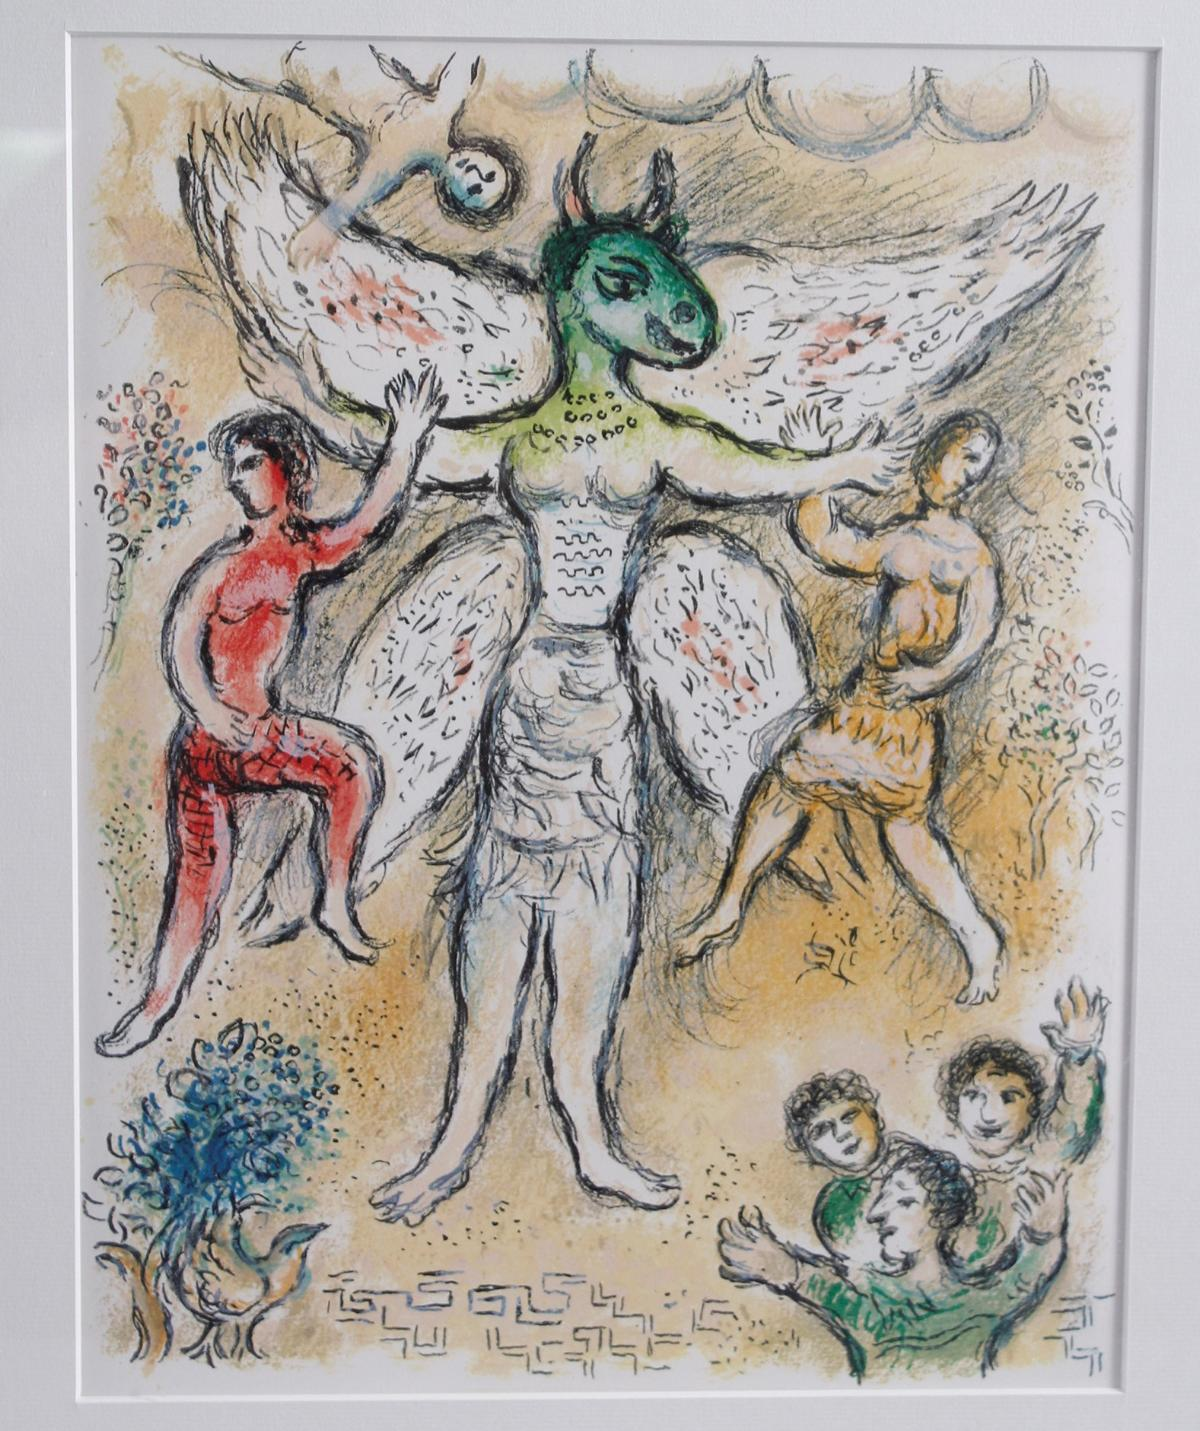 Marc Chagall, Farblithografie aus der Odyssee-2